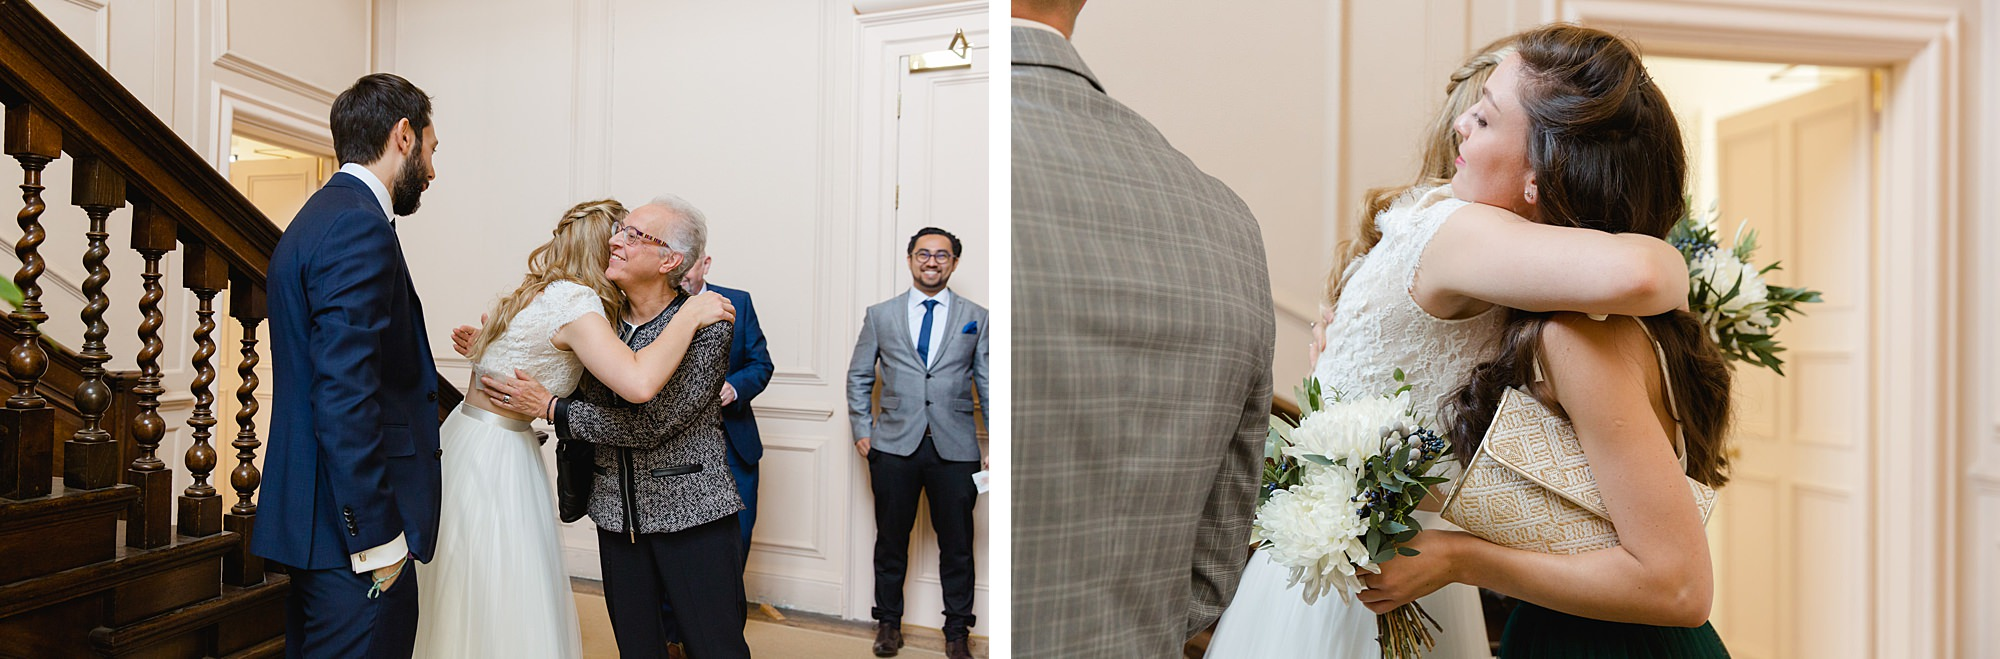 shaw house wedding bride and groom hug guests